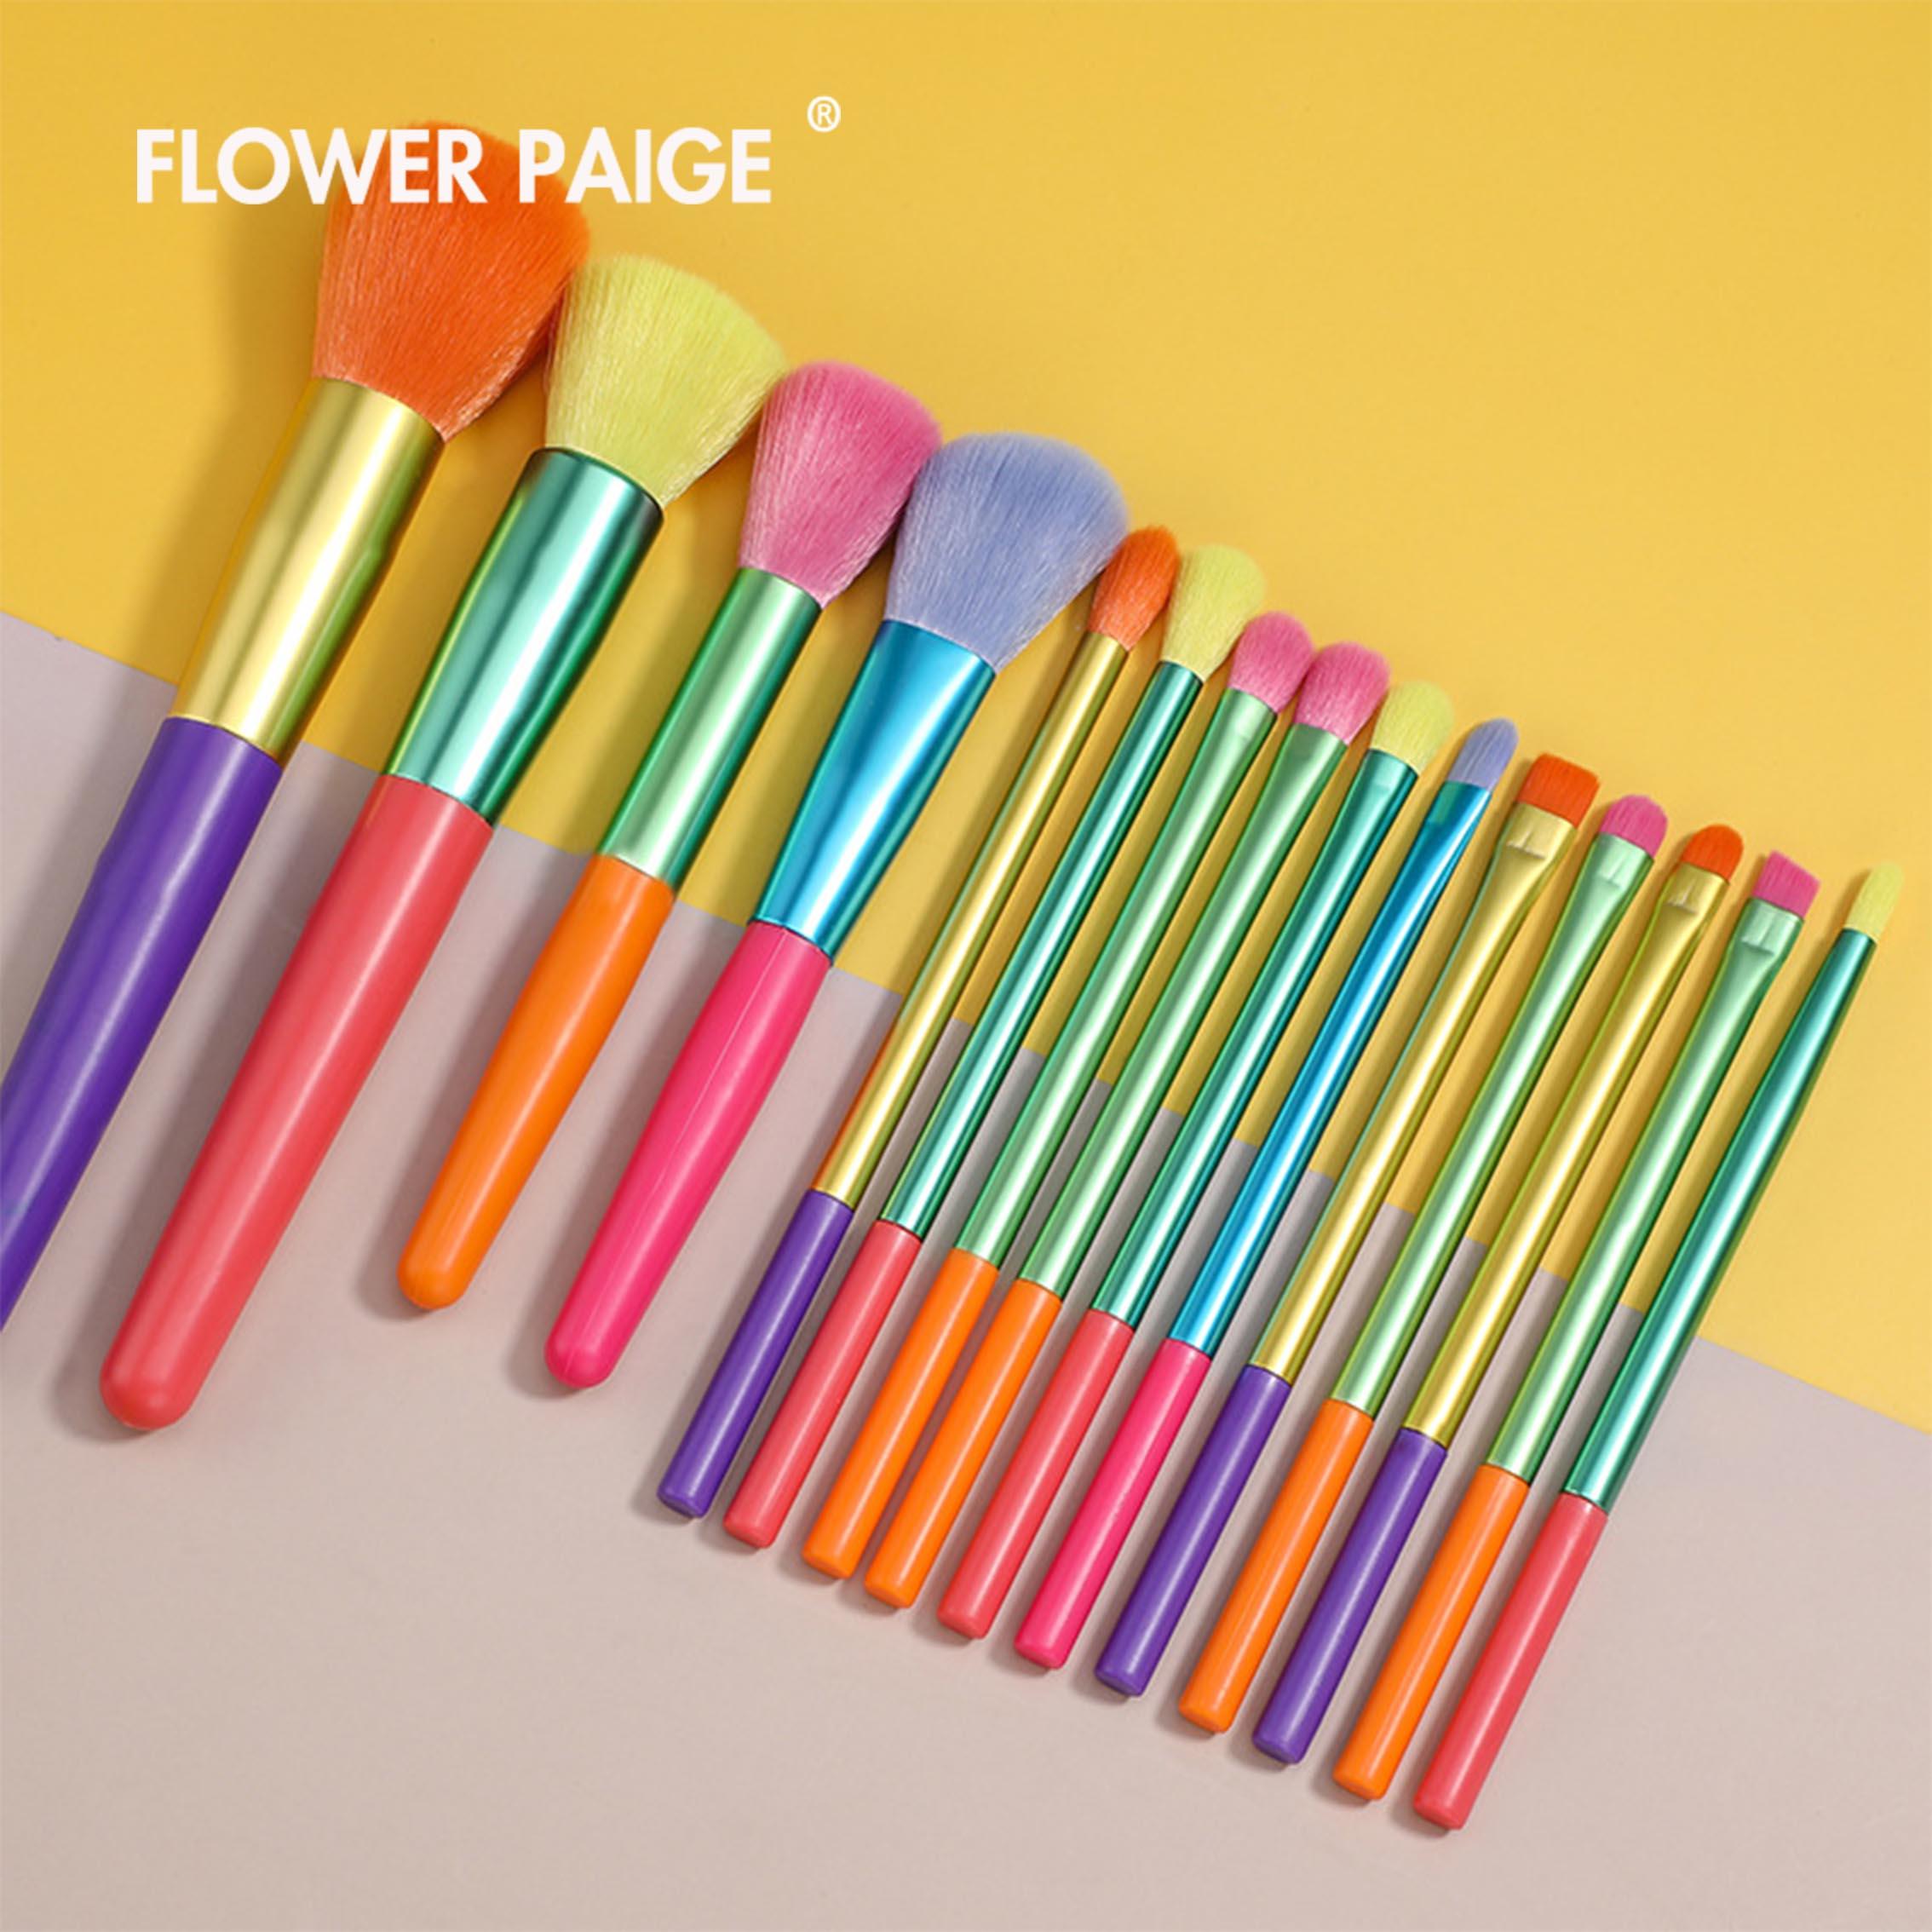 rainbow Makeup Brush Set FLOWER PAIGE Makeup Brushes 15 Pcs Premium Synthetic Foundation Blending Fa